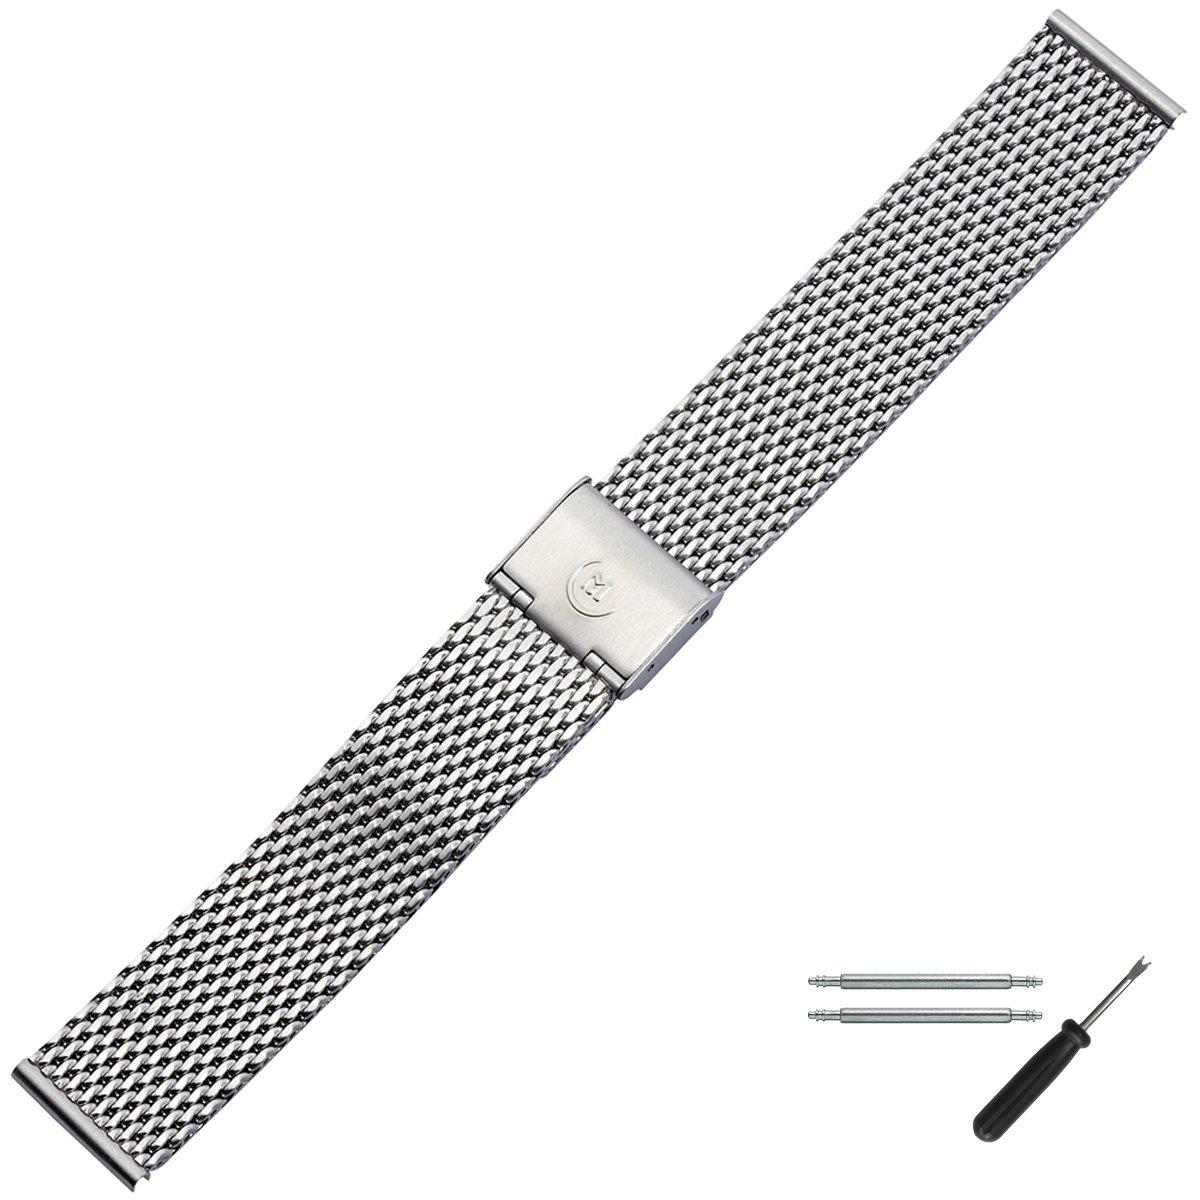 MARBURGER-Uhrenarmband-22mm-Edelstahl-Silber-MeshMilanaise-Uhrband-Set-84907220020